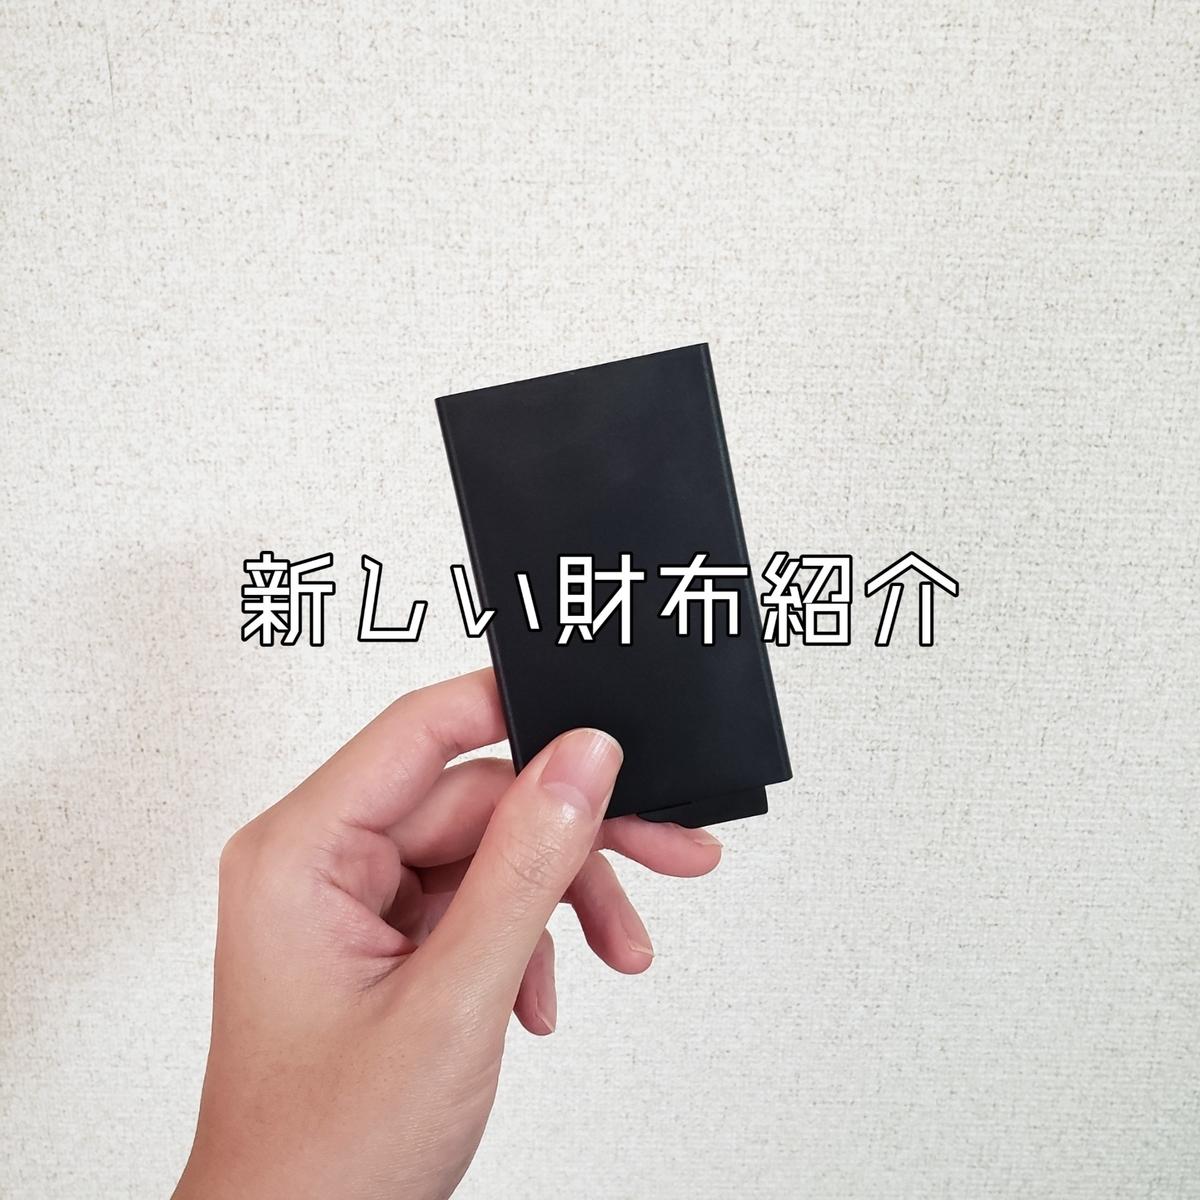 f:id:hihowru:20200510233700j:plain